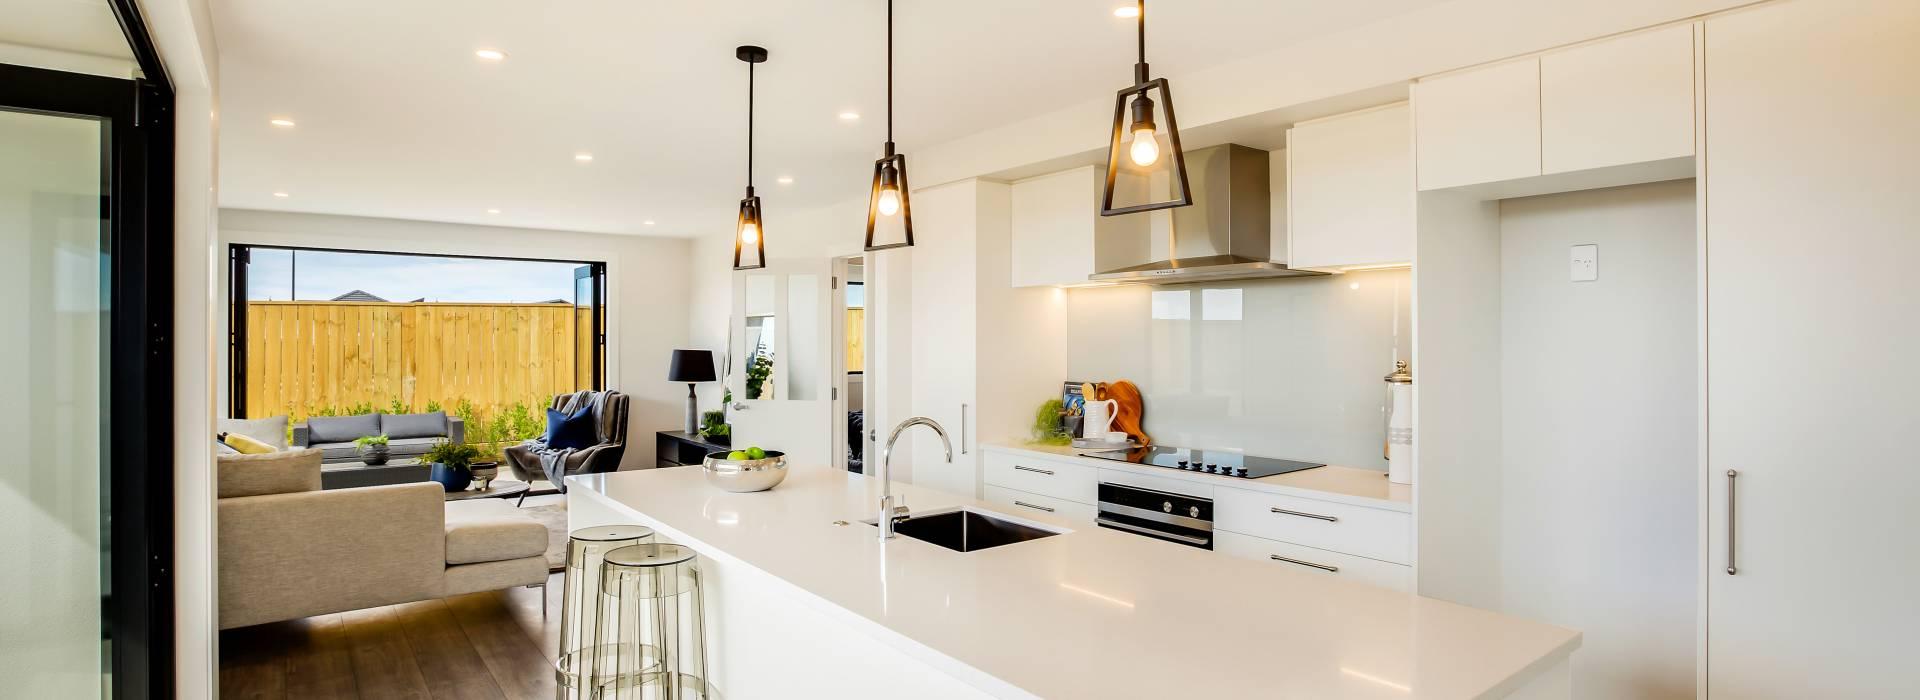 Signature Homes, Show Home - Ockleston Landing